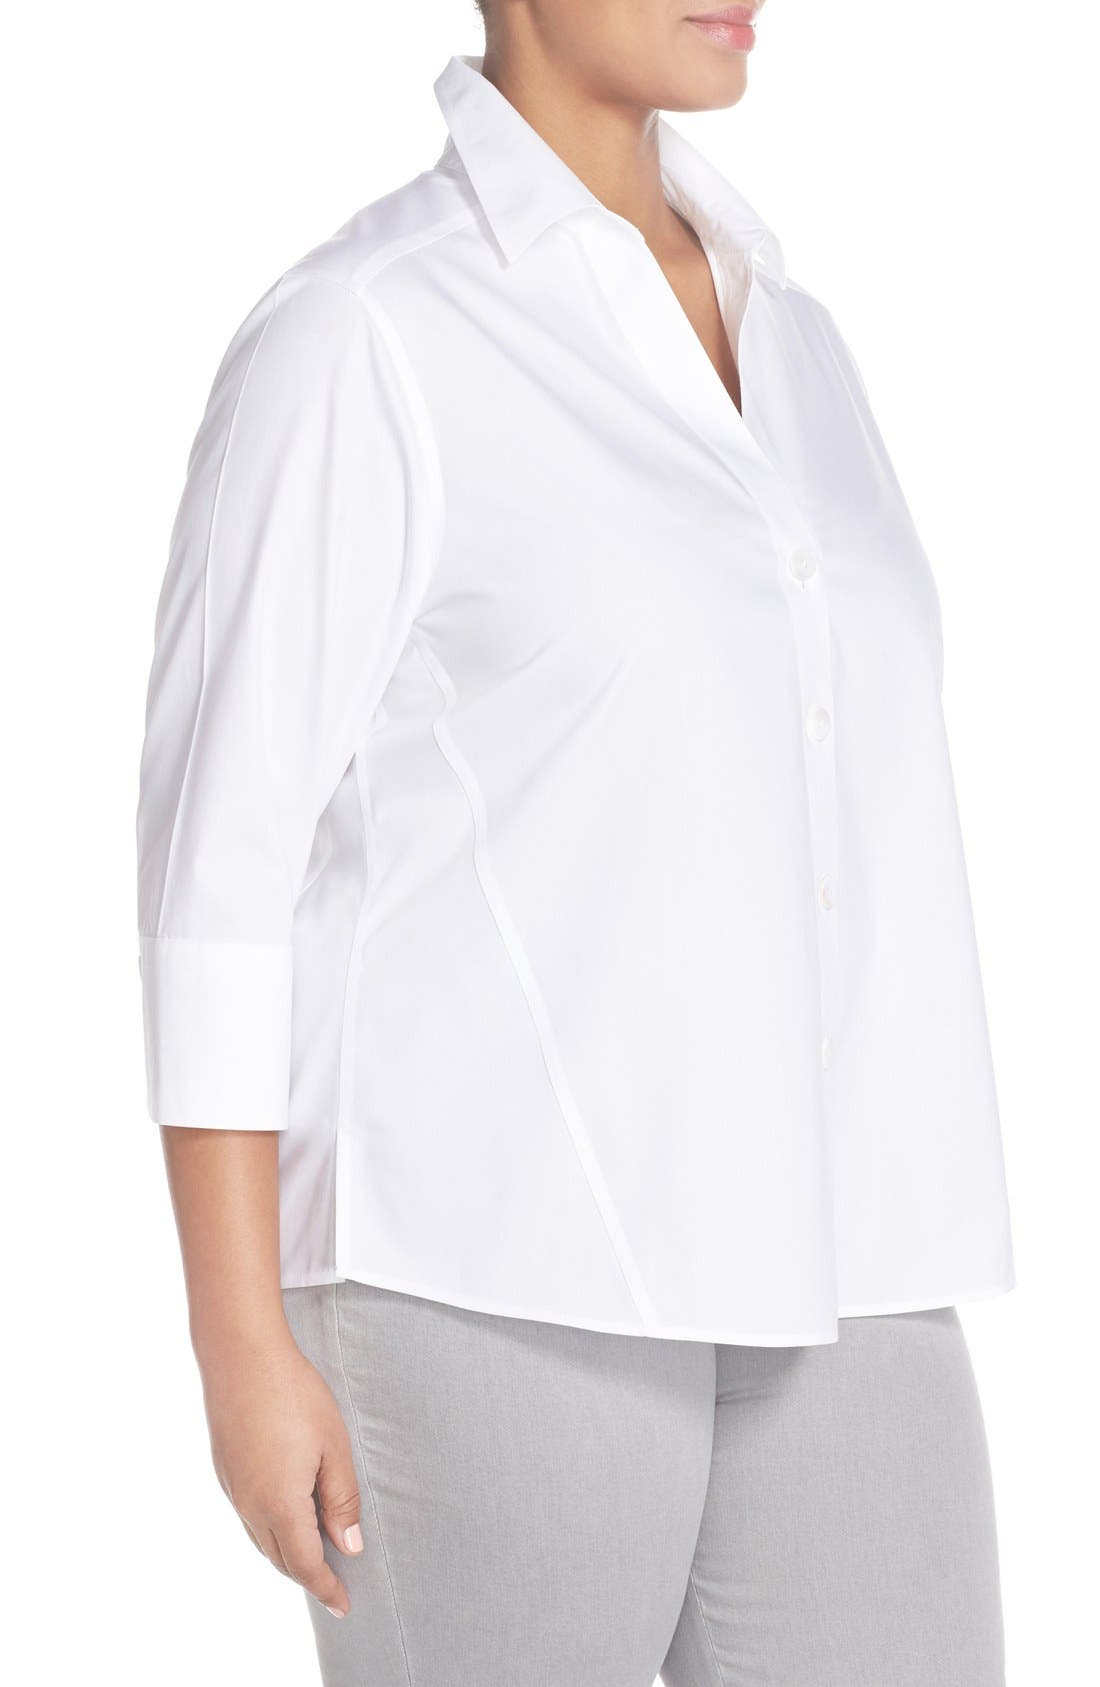 Paige Non-Iron Cotton Shirt,                             Alternate thumbnail 6, color,                             WHITE